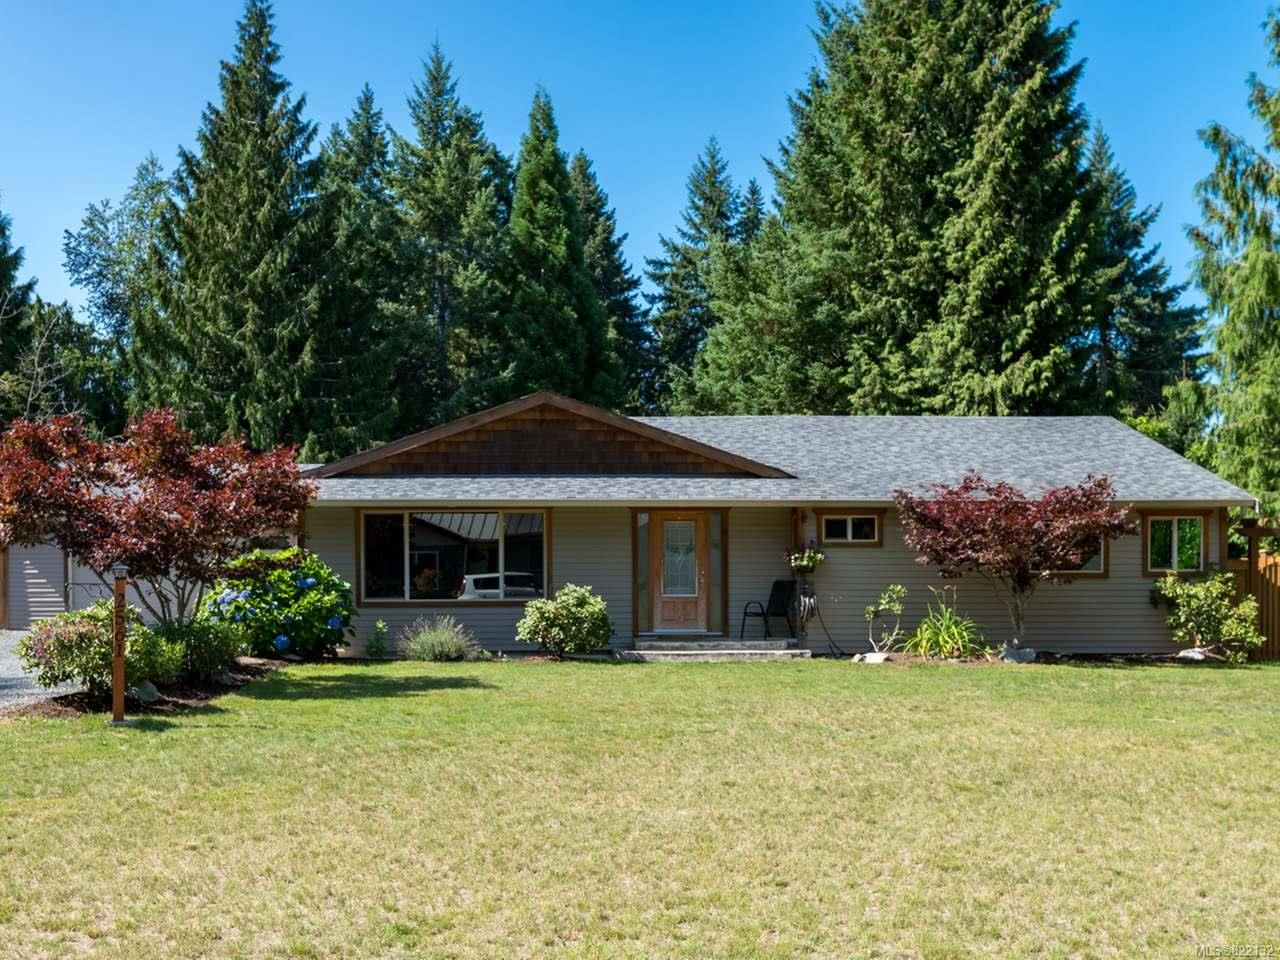 Main Photo: 2561 Webdon Rd in COURTENAY: CV Courtenay West House for sale (Comox Valley)  : MLS®# 822132